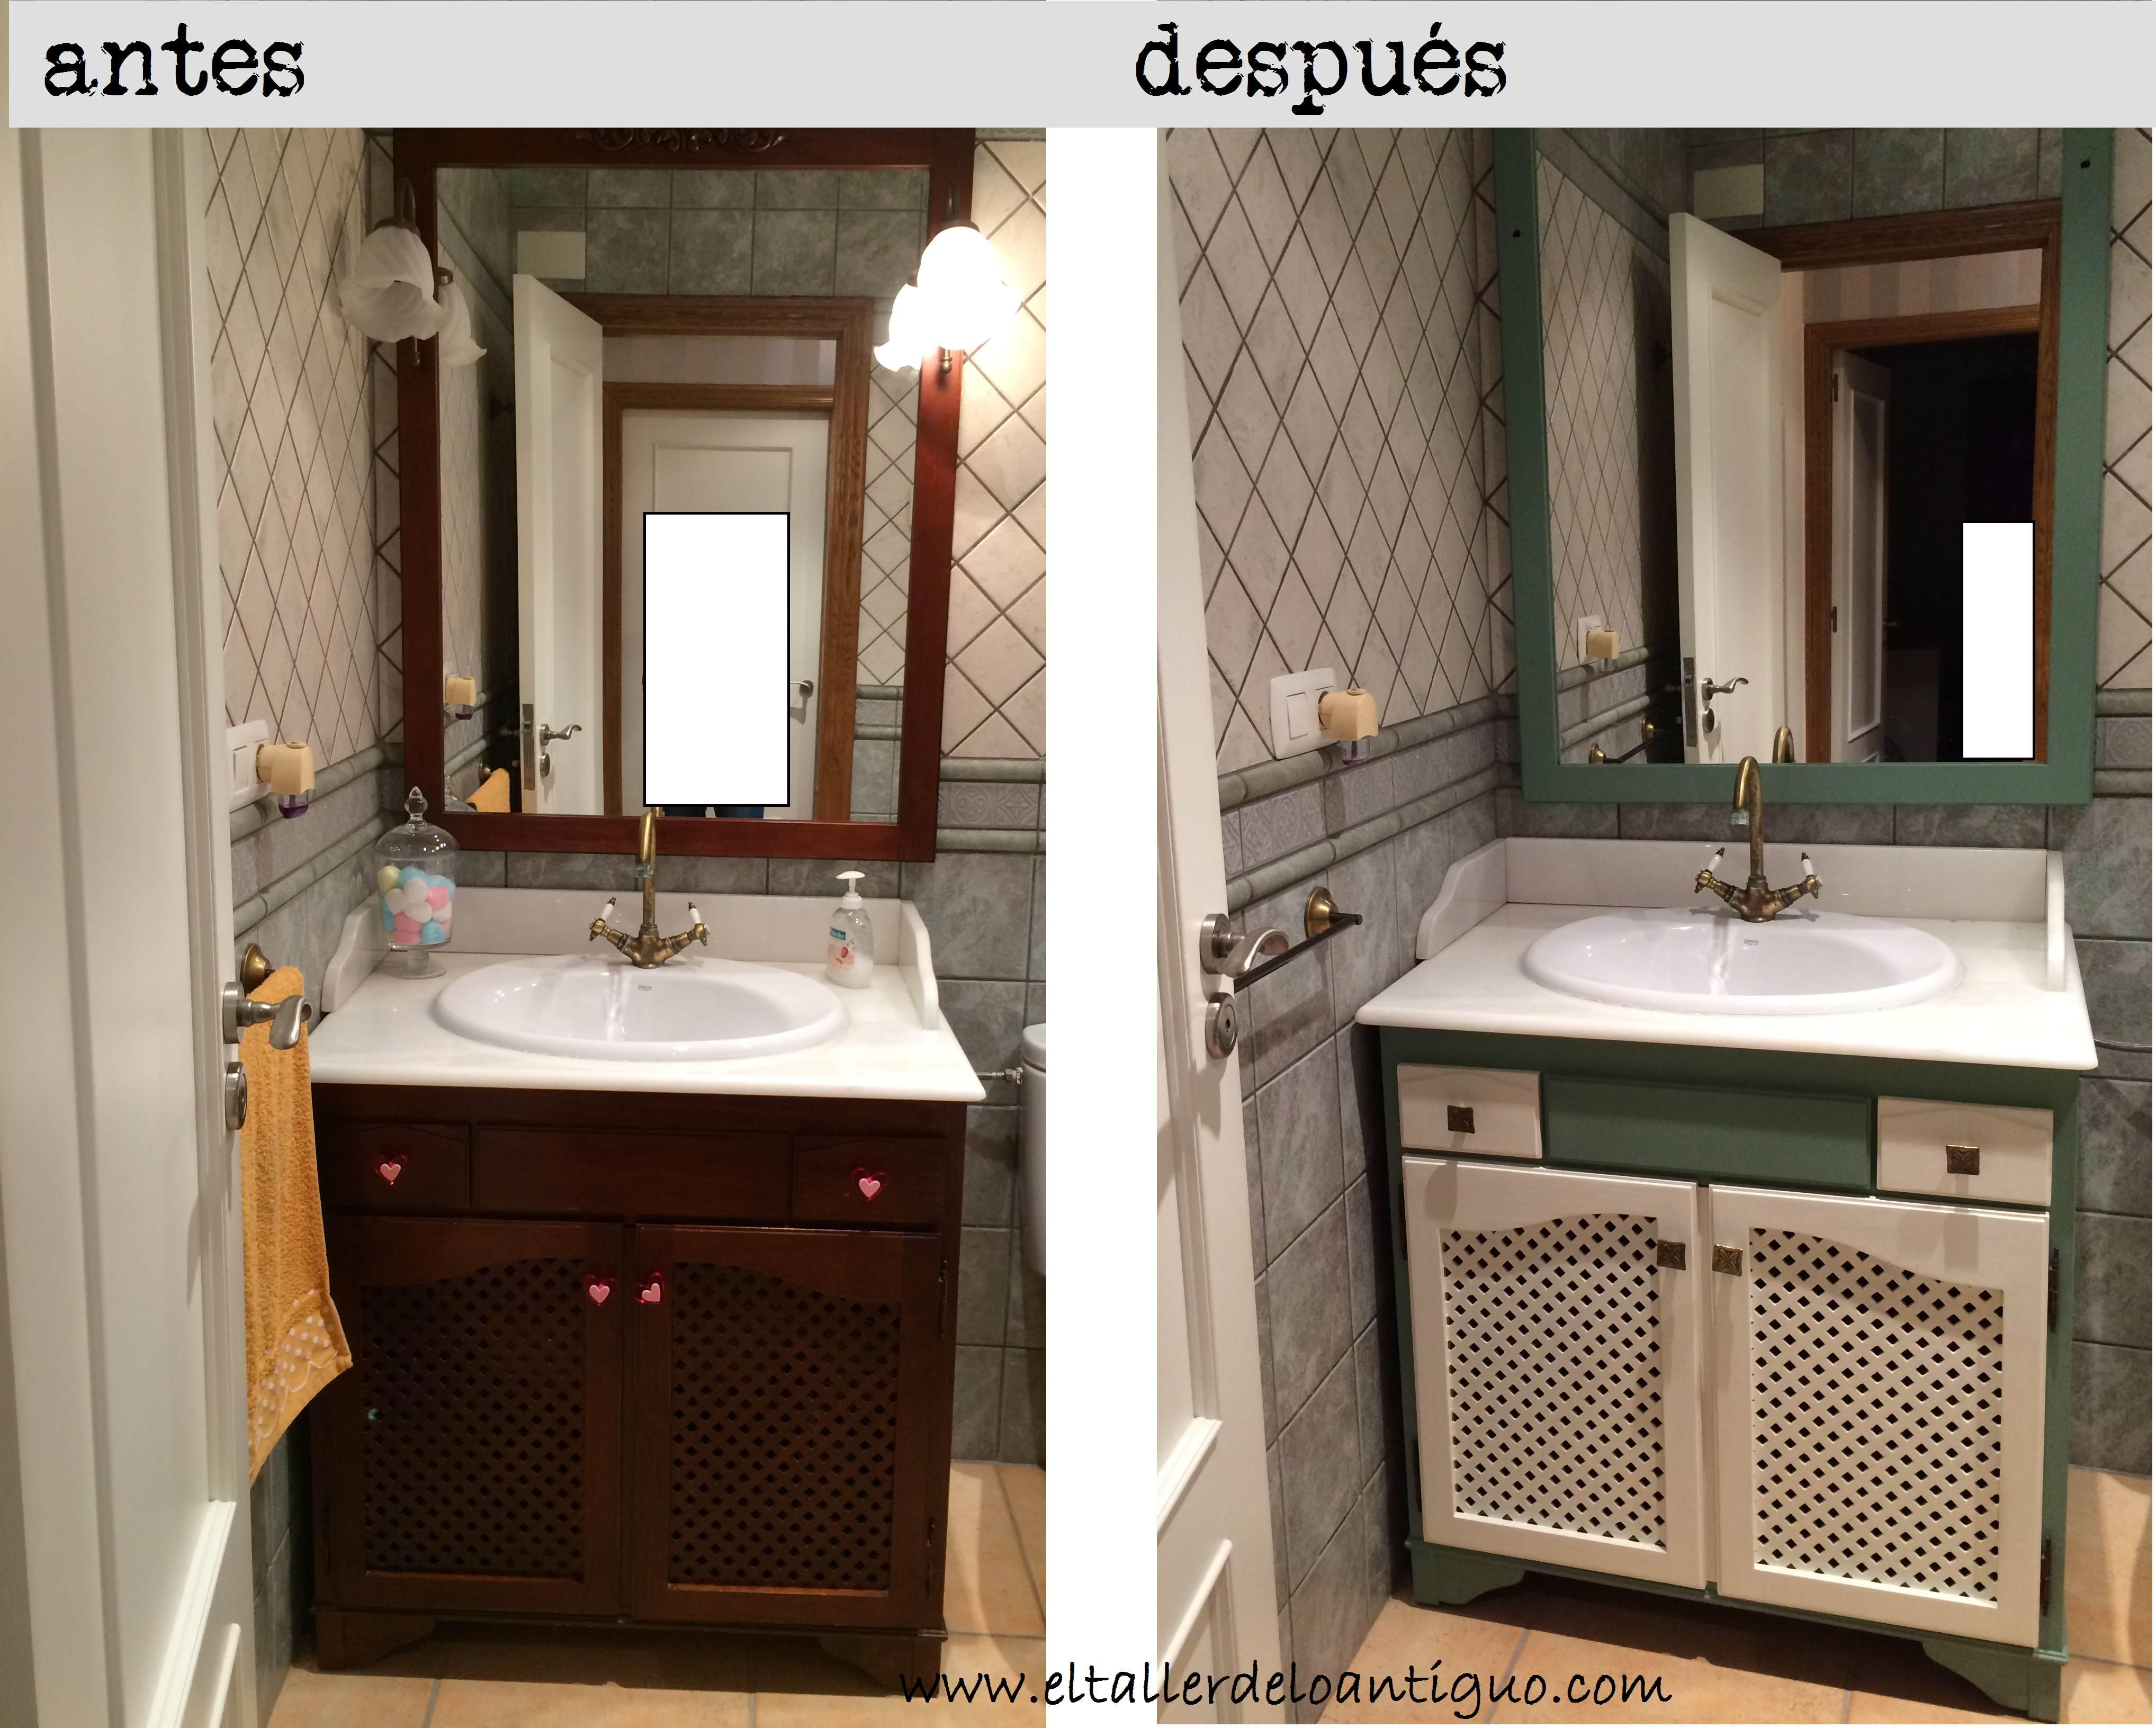 Pintar mueble de ba o el taller de lo antiguo for Como empapelar un mueble